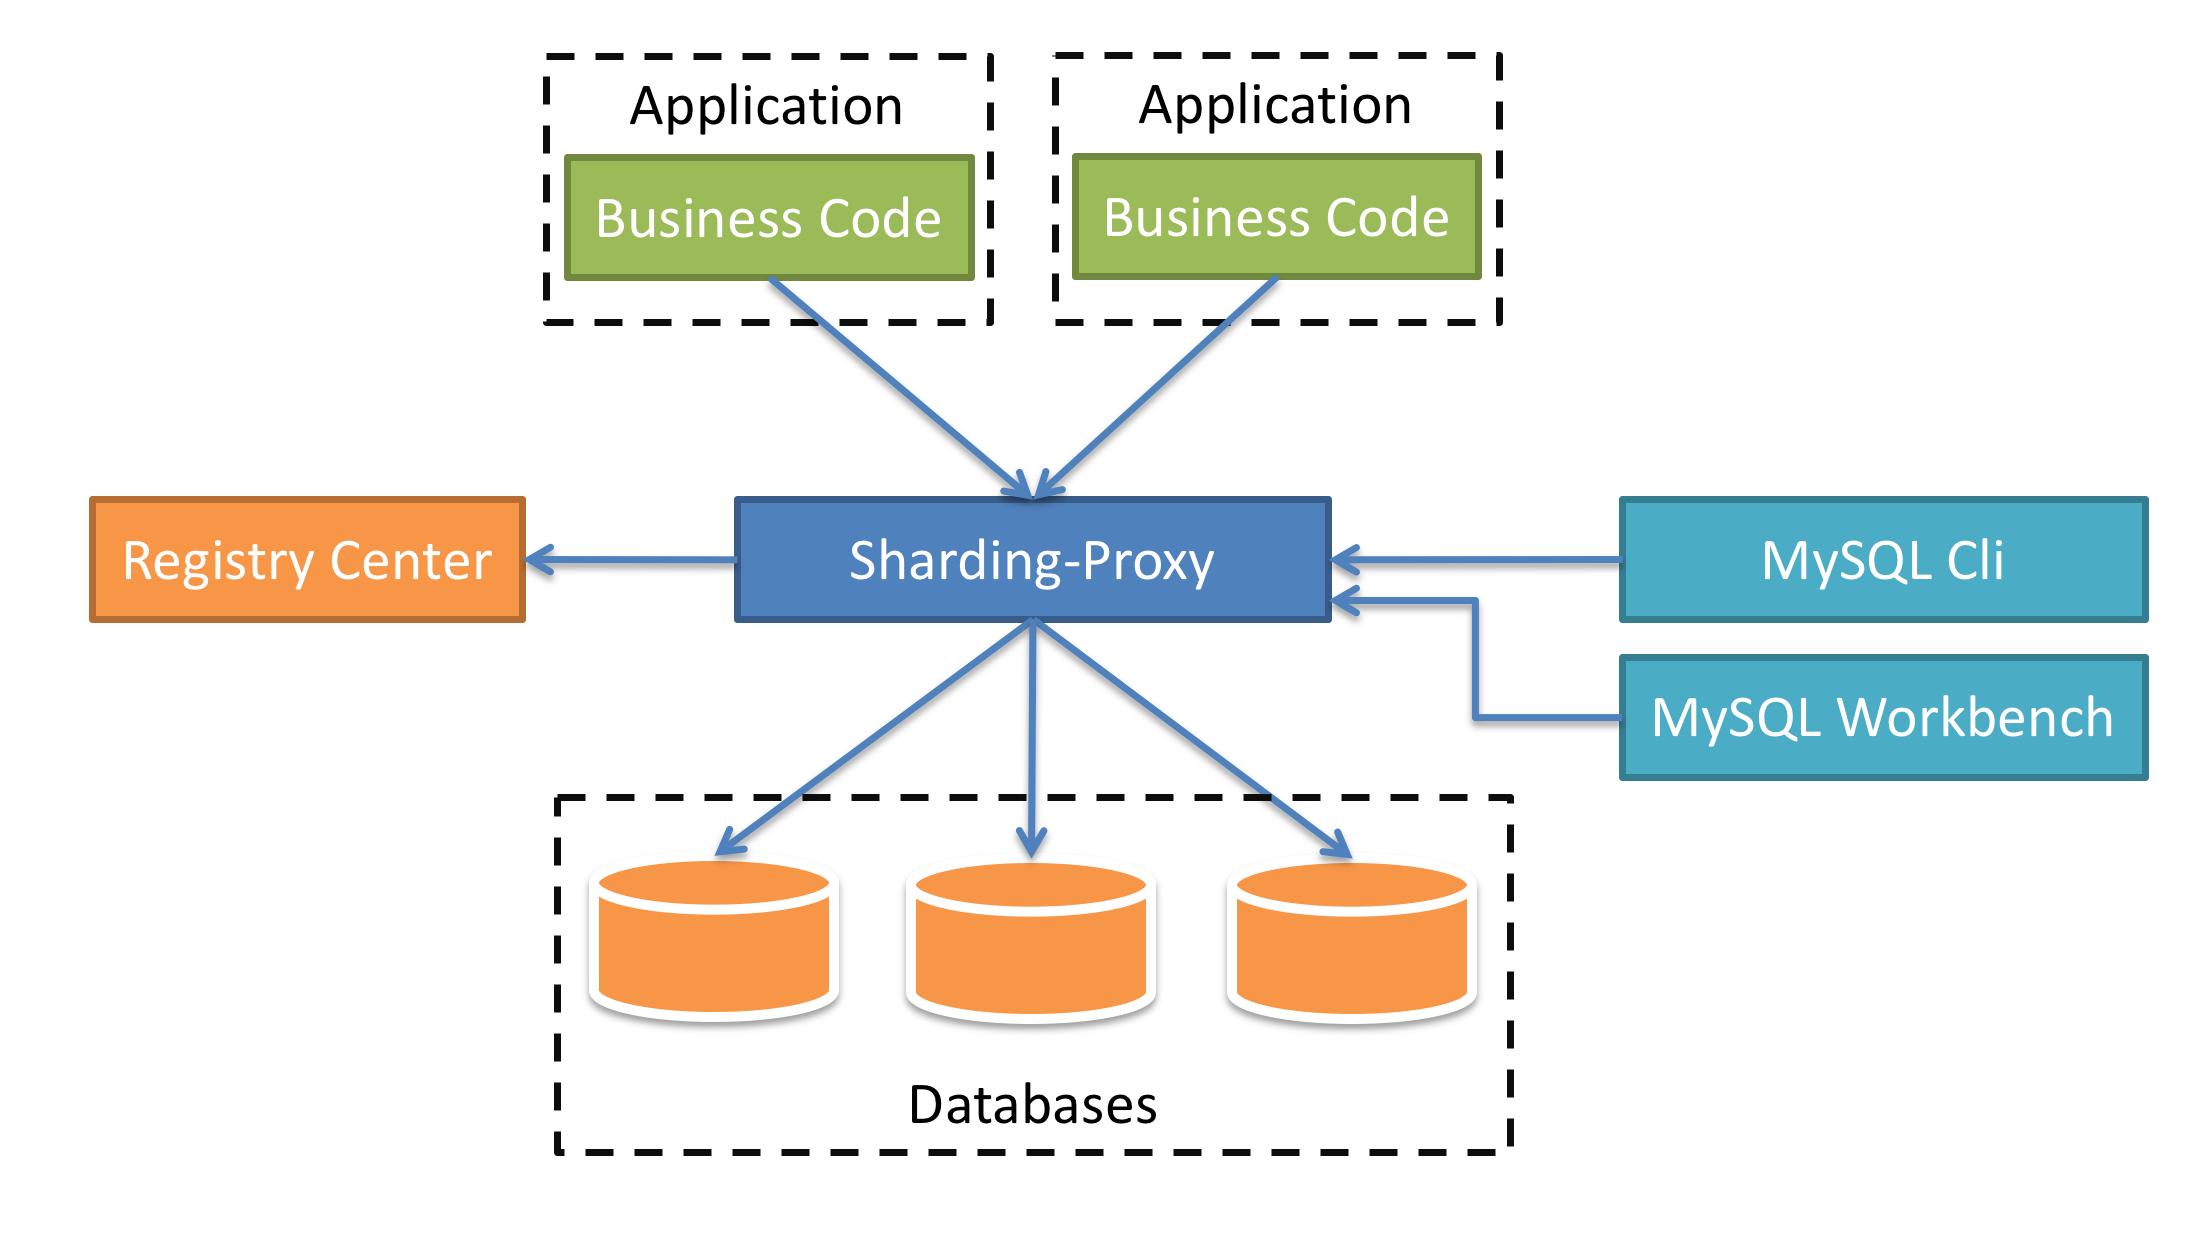 Sharding-Proxy